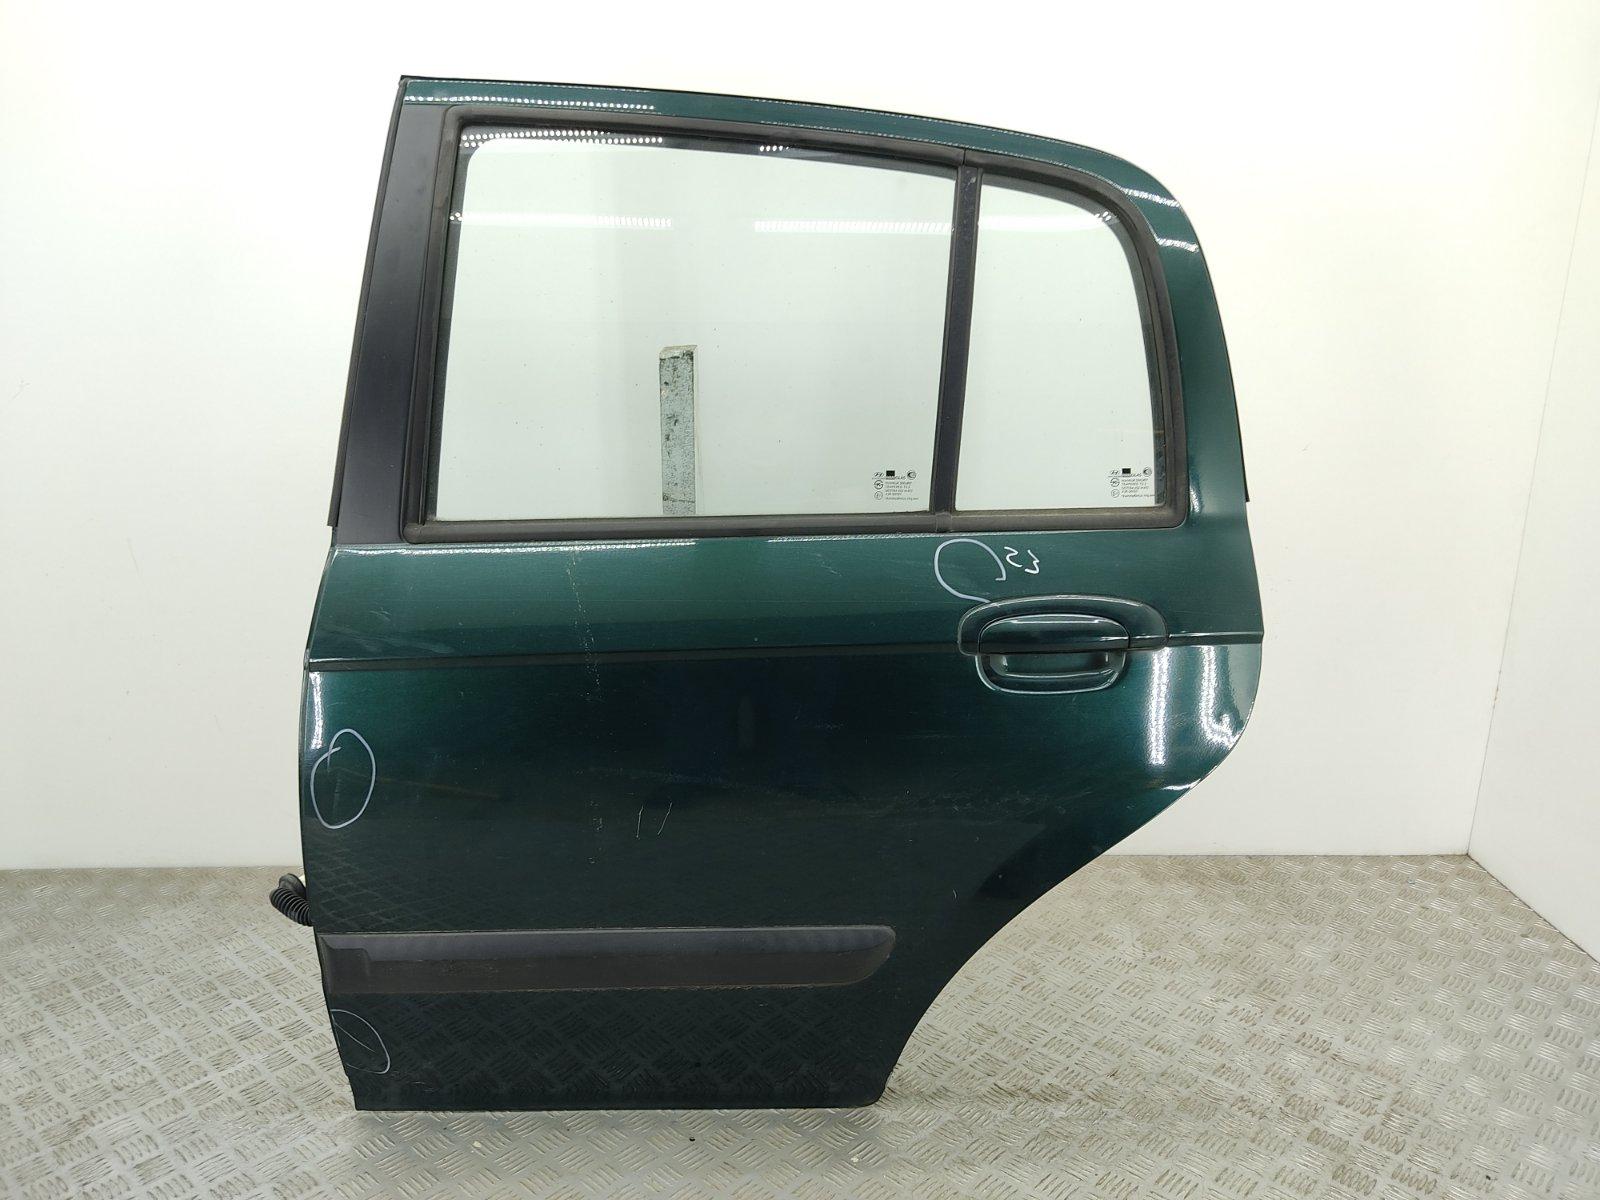 Дверь задняя левая Hyundai Getz 1.1 I 2003 (б/у)